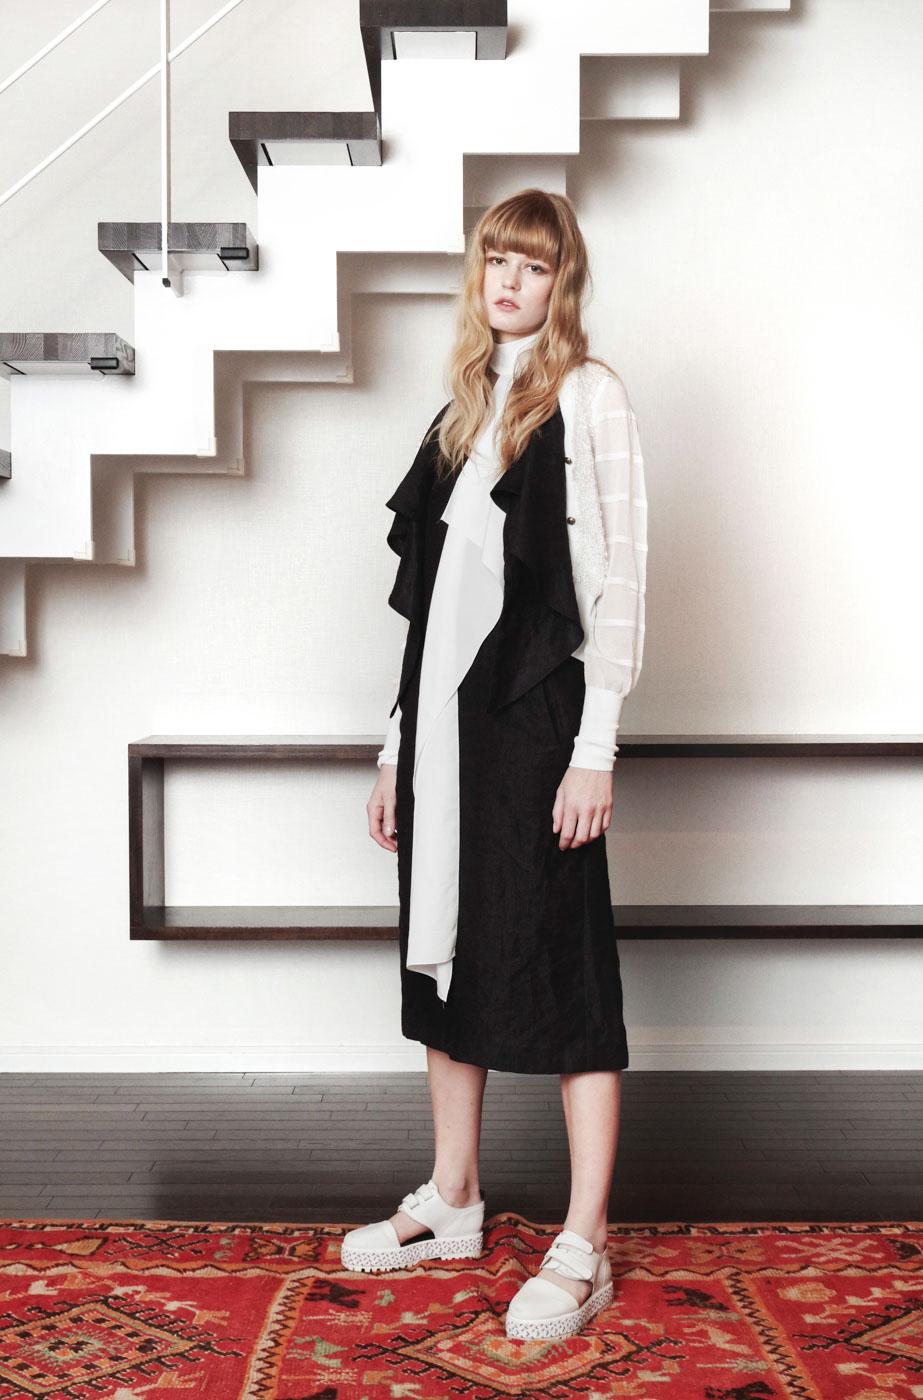 19039 Cardigan ¥24,000, 19003 Dress ¥48,000, 19038 Scarf ¥9,000